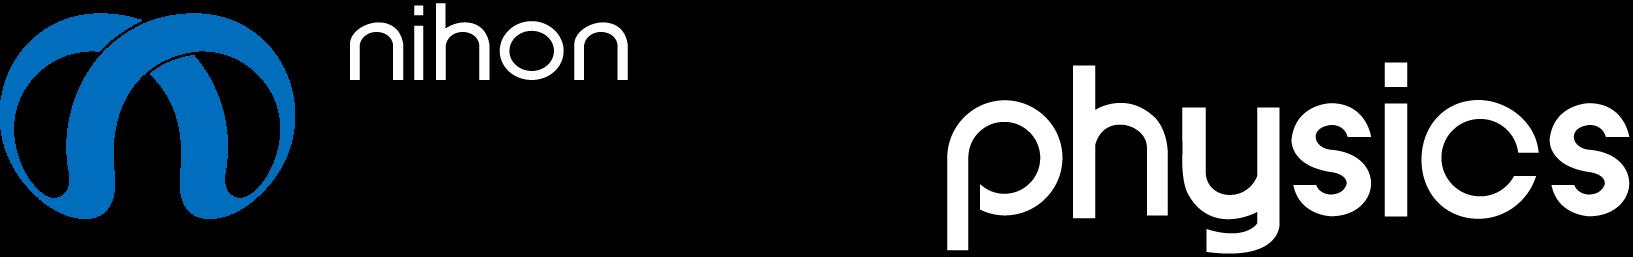 logo(Nihon Medi-Physics).png